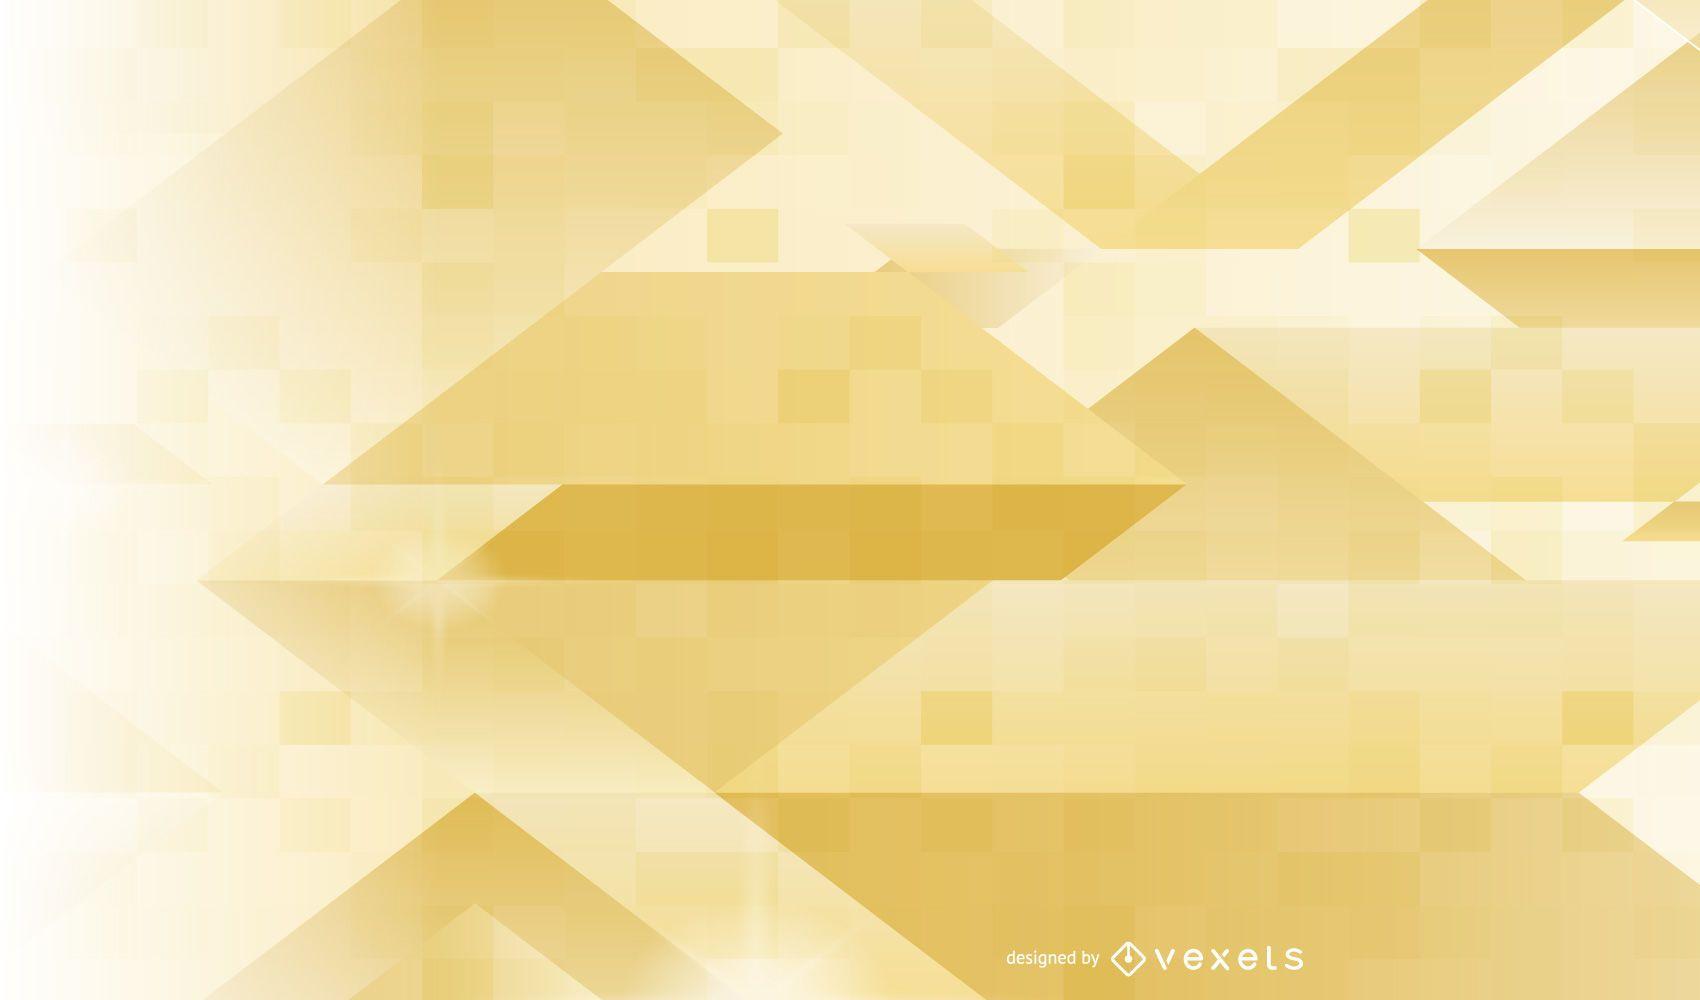 Abstract Golden Linen Texture Insert Between Background